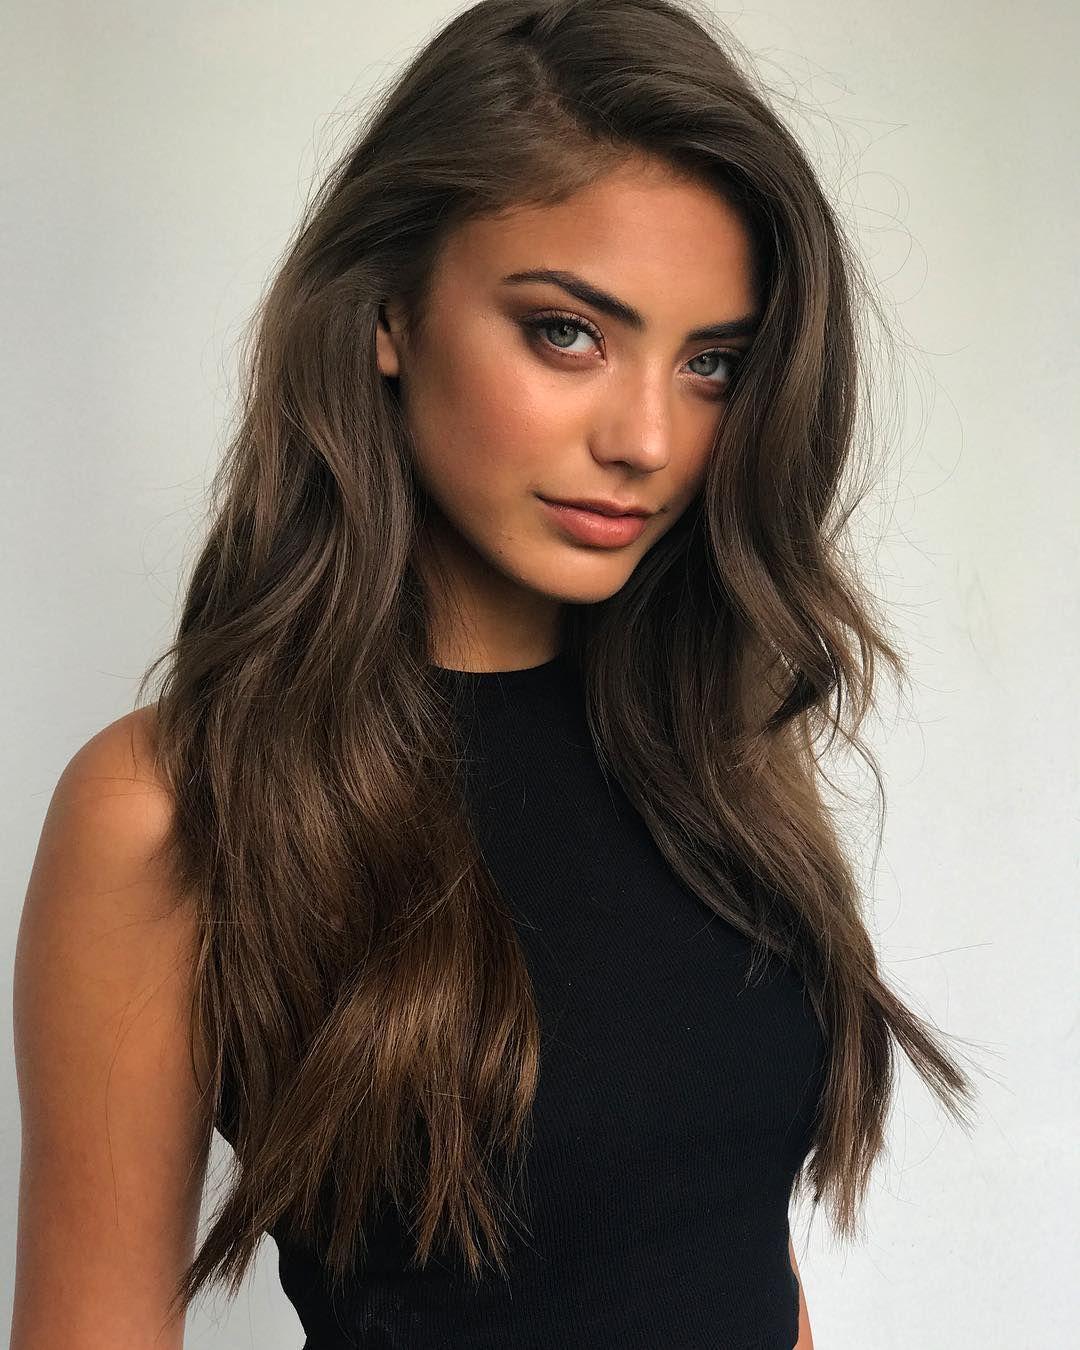 560 7 Mil Seguidores 1 424 Seguindo 3 149 Publicacoes Veja As Fotos E Videos Do Instagram De Sara Crampton H Cool Hairstyles Hair Styles Light Brown Hair